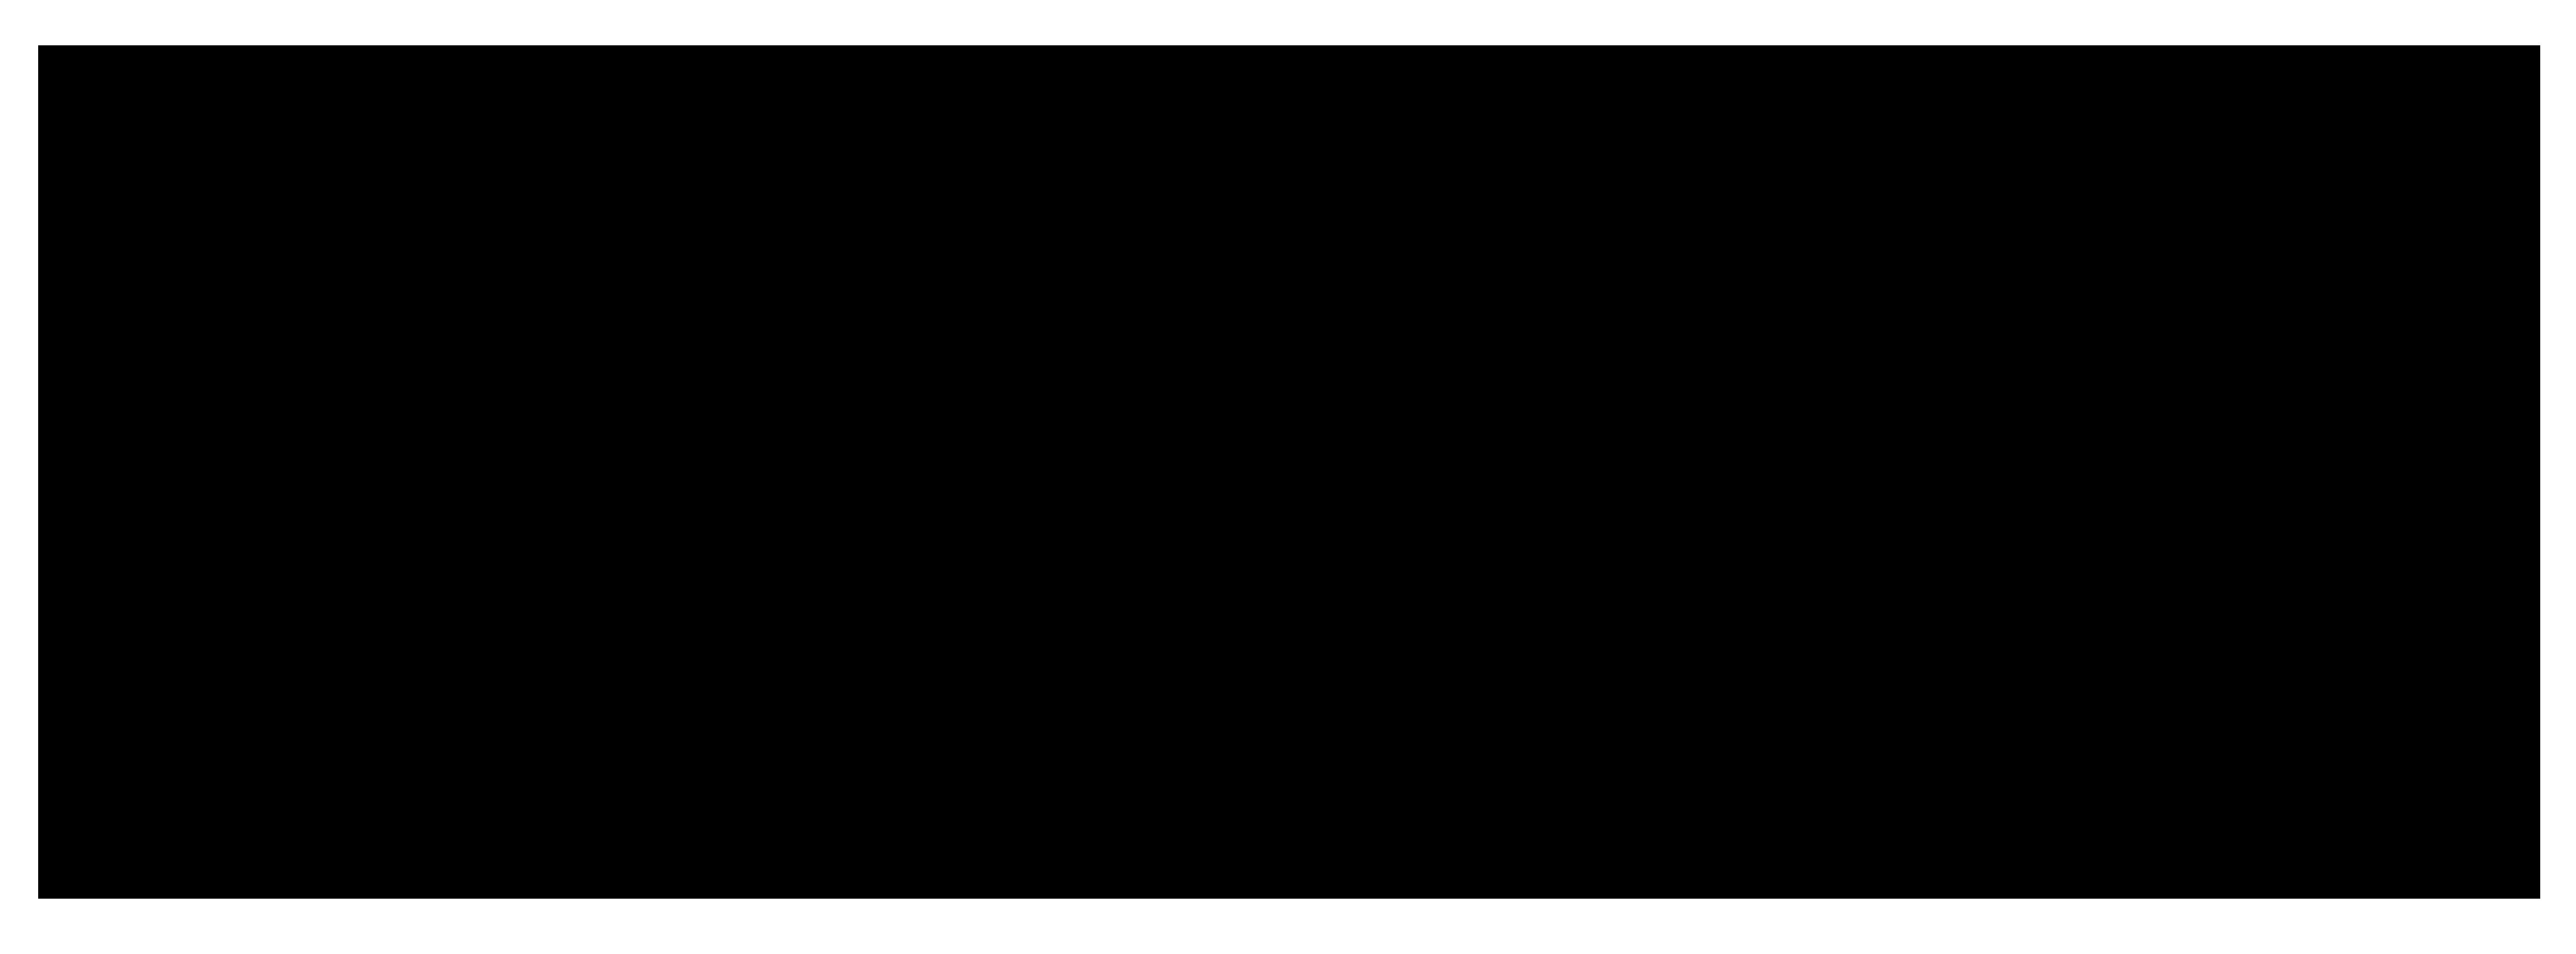 tigi hair products logo tigi professional logos download